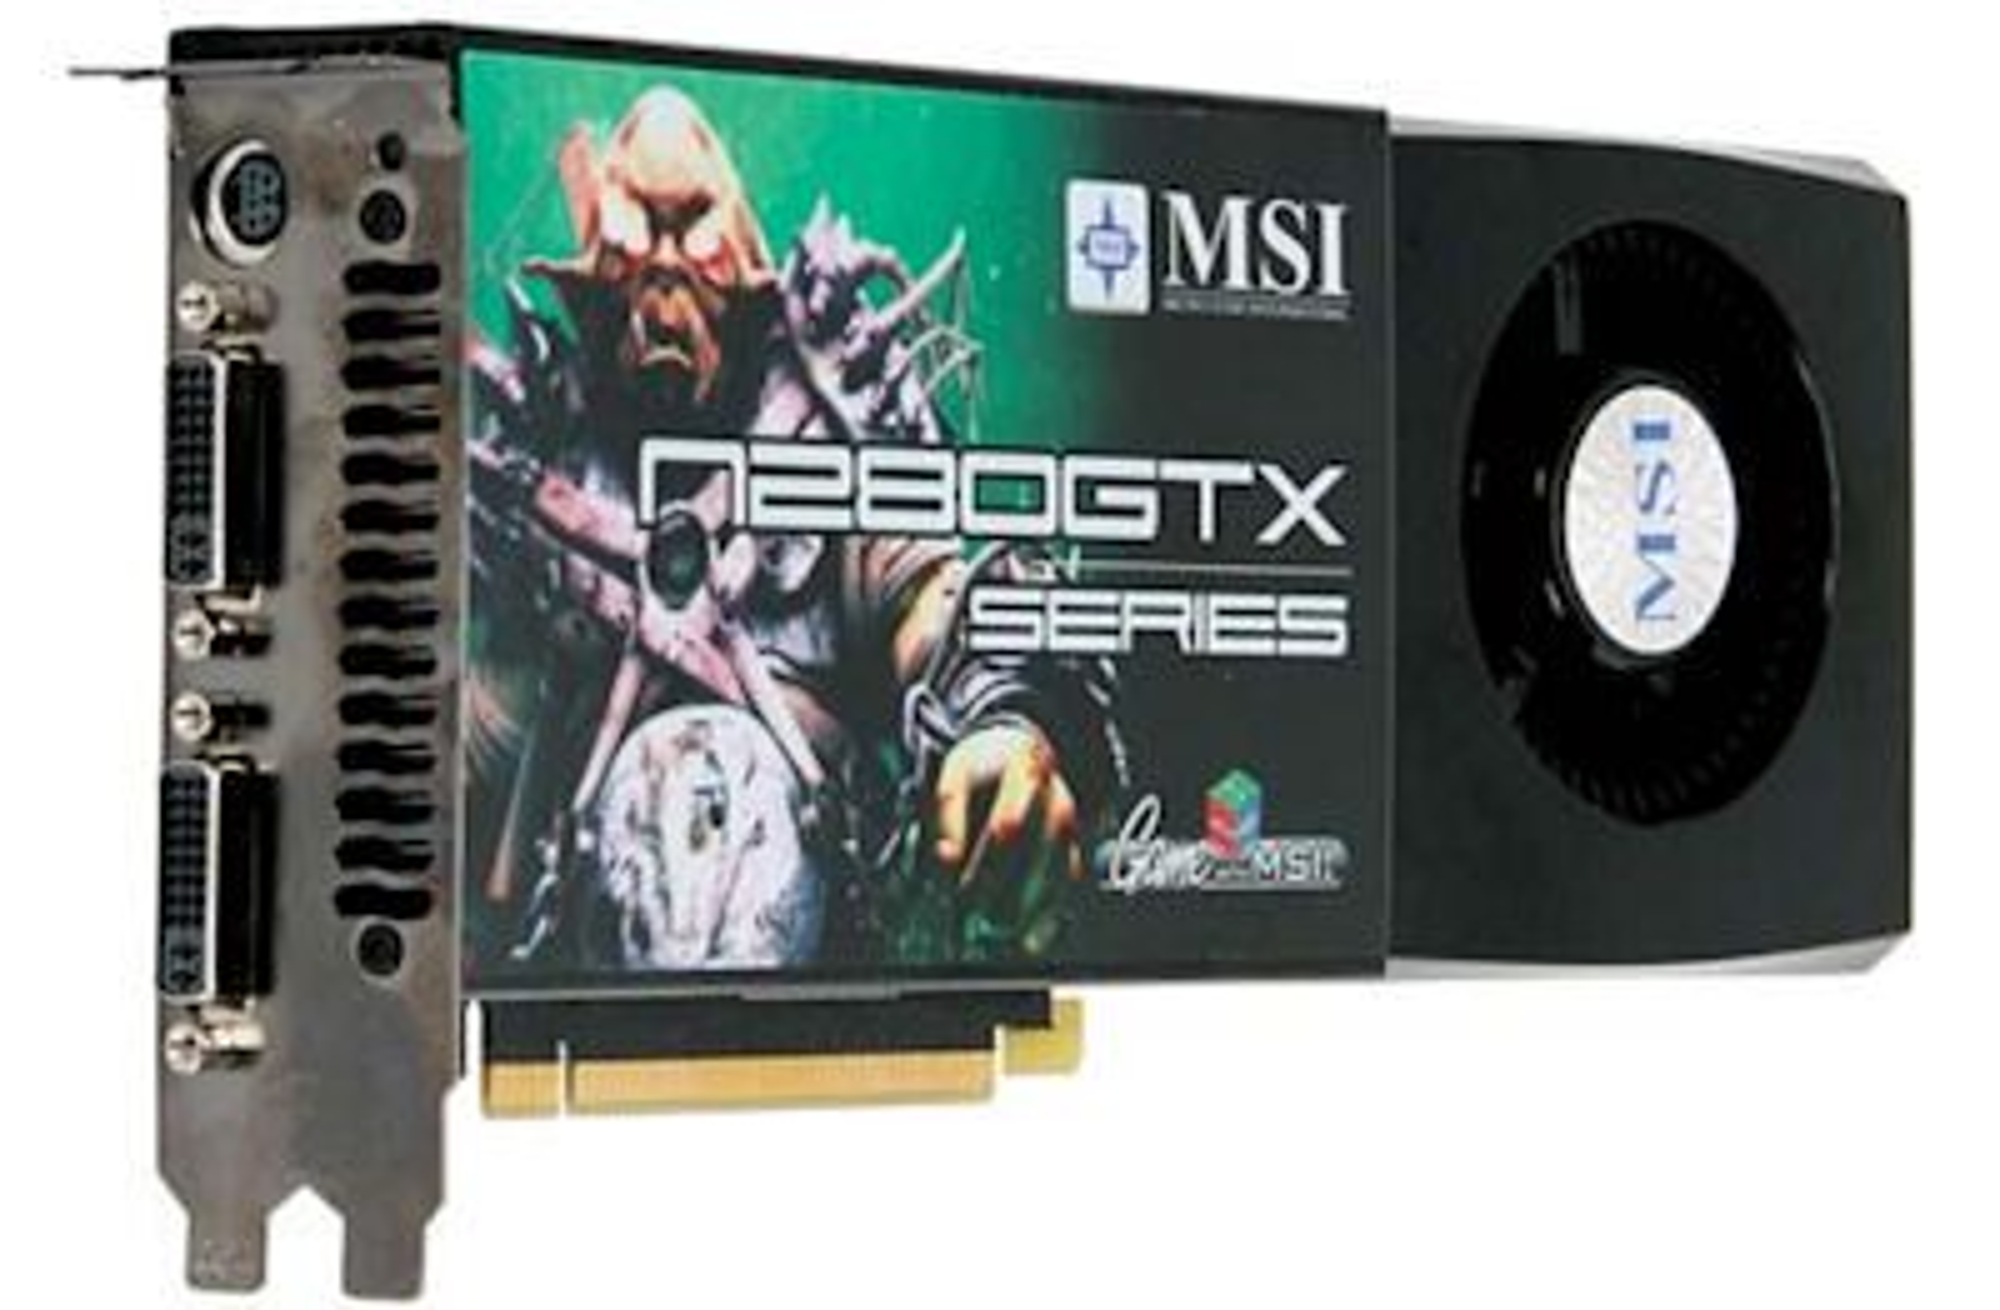 Forceware støtter nå Geforce GTX 200-serien